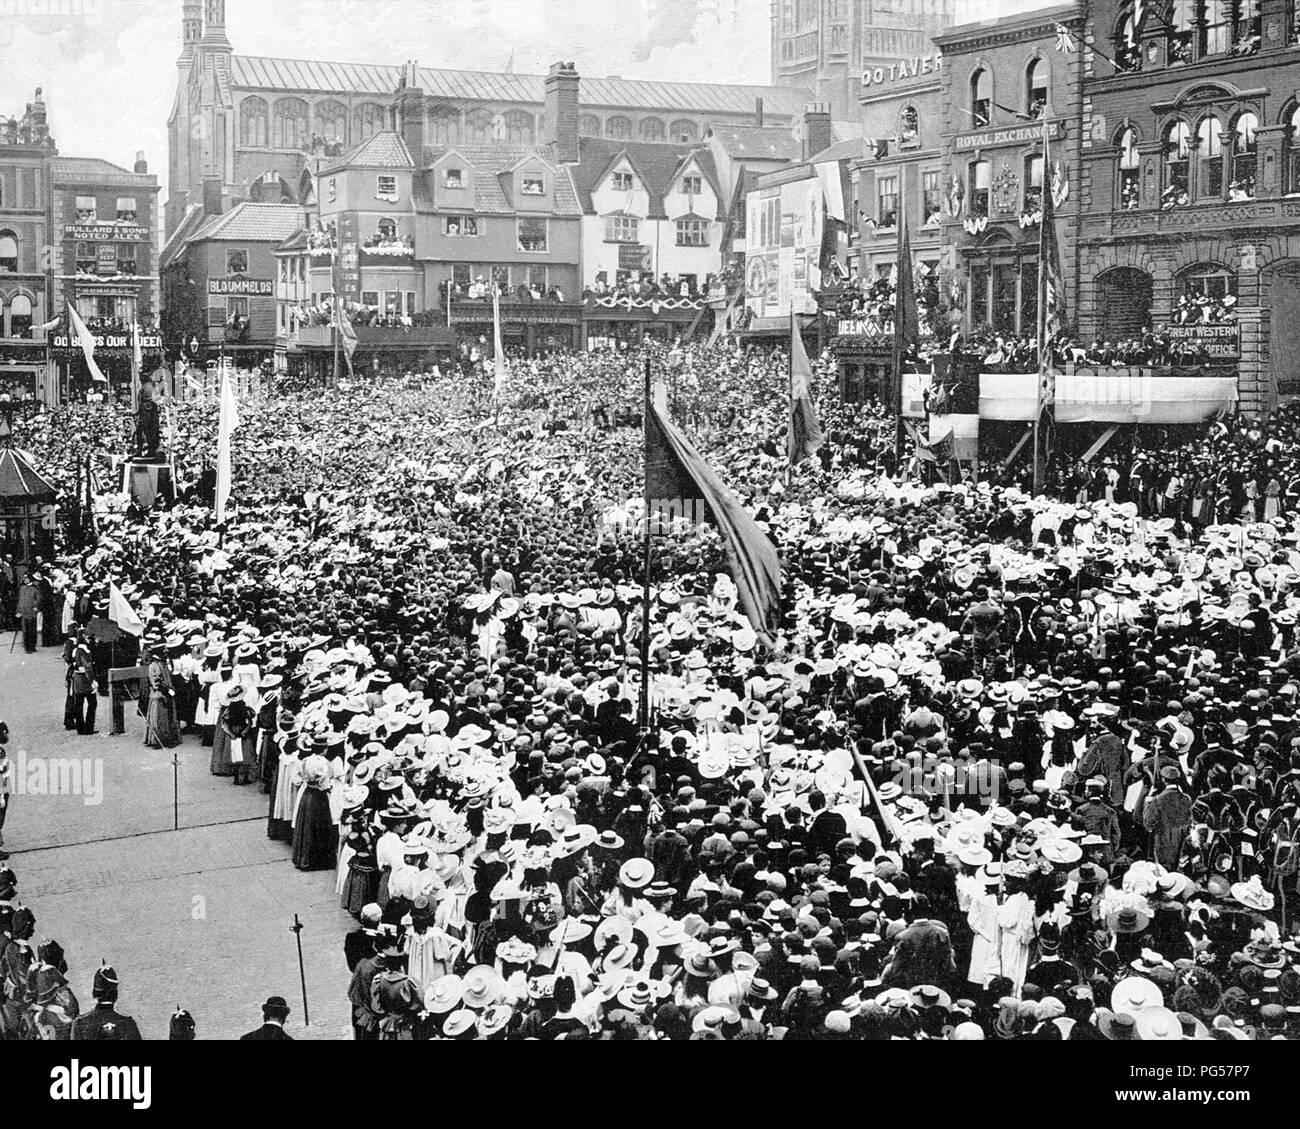 Queen Victoria's Jubilee Celebrations, Norwich, Victorian period - Stock Image